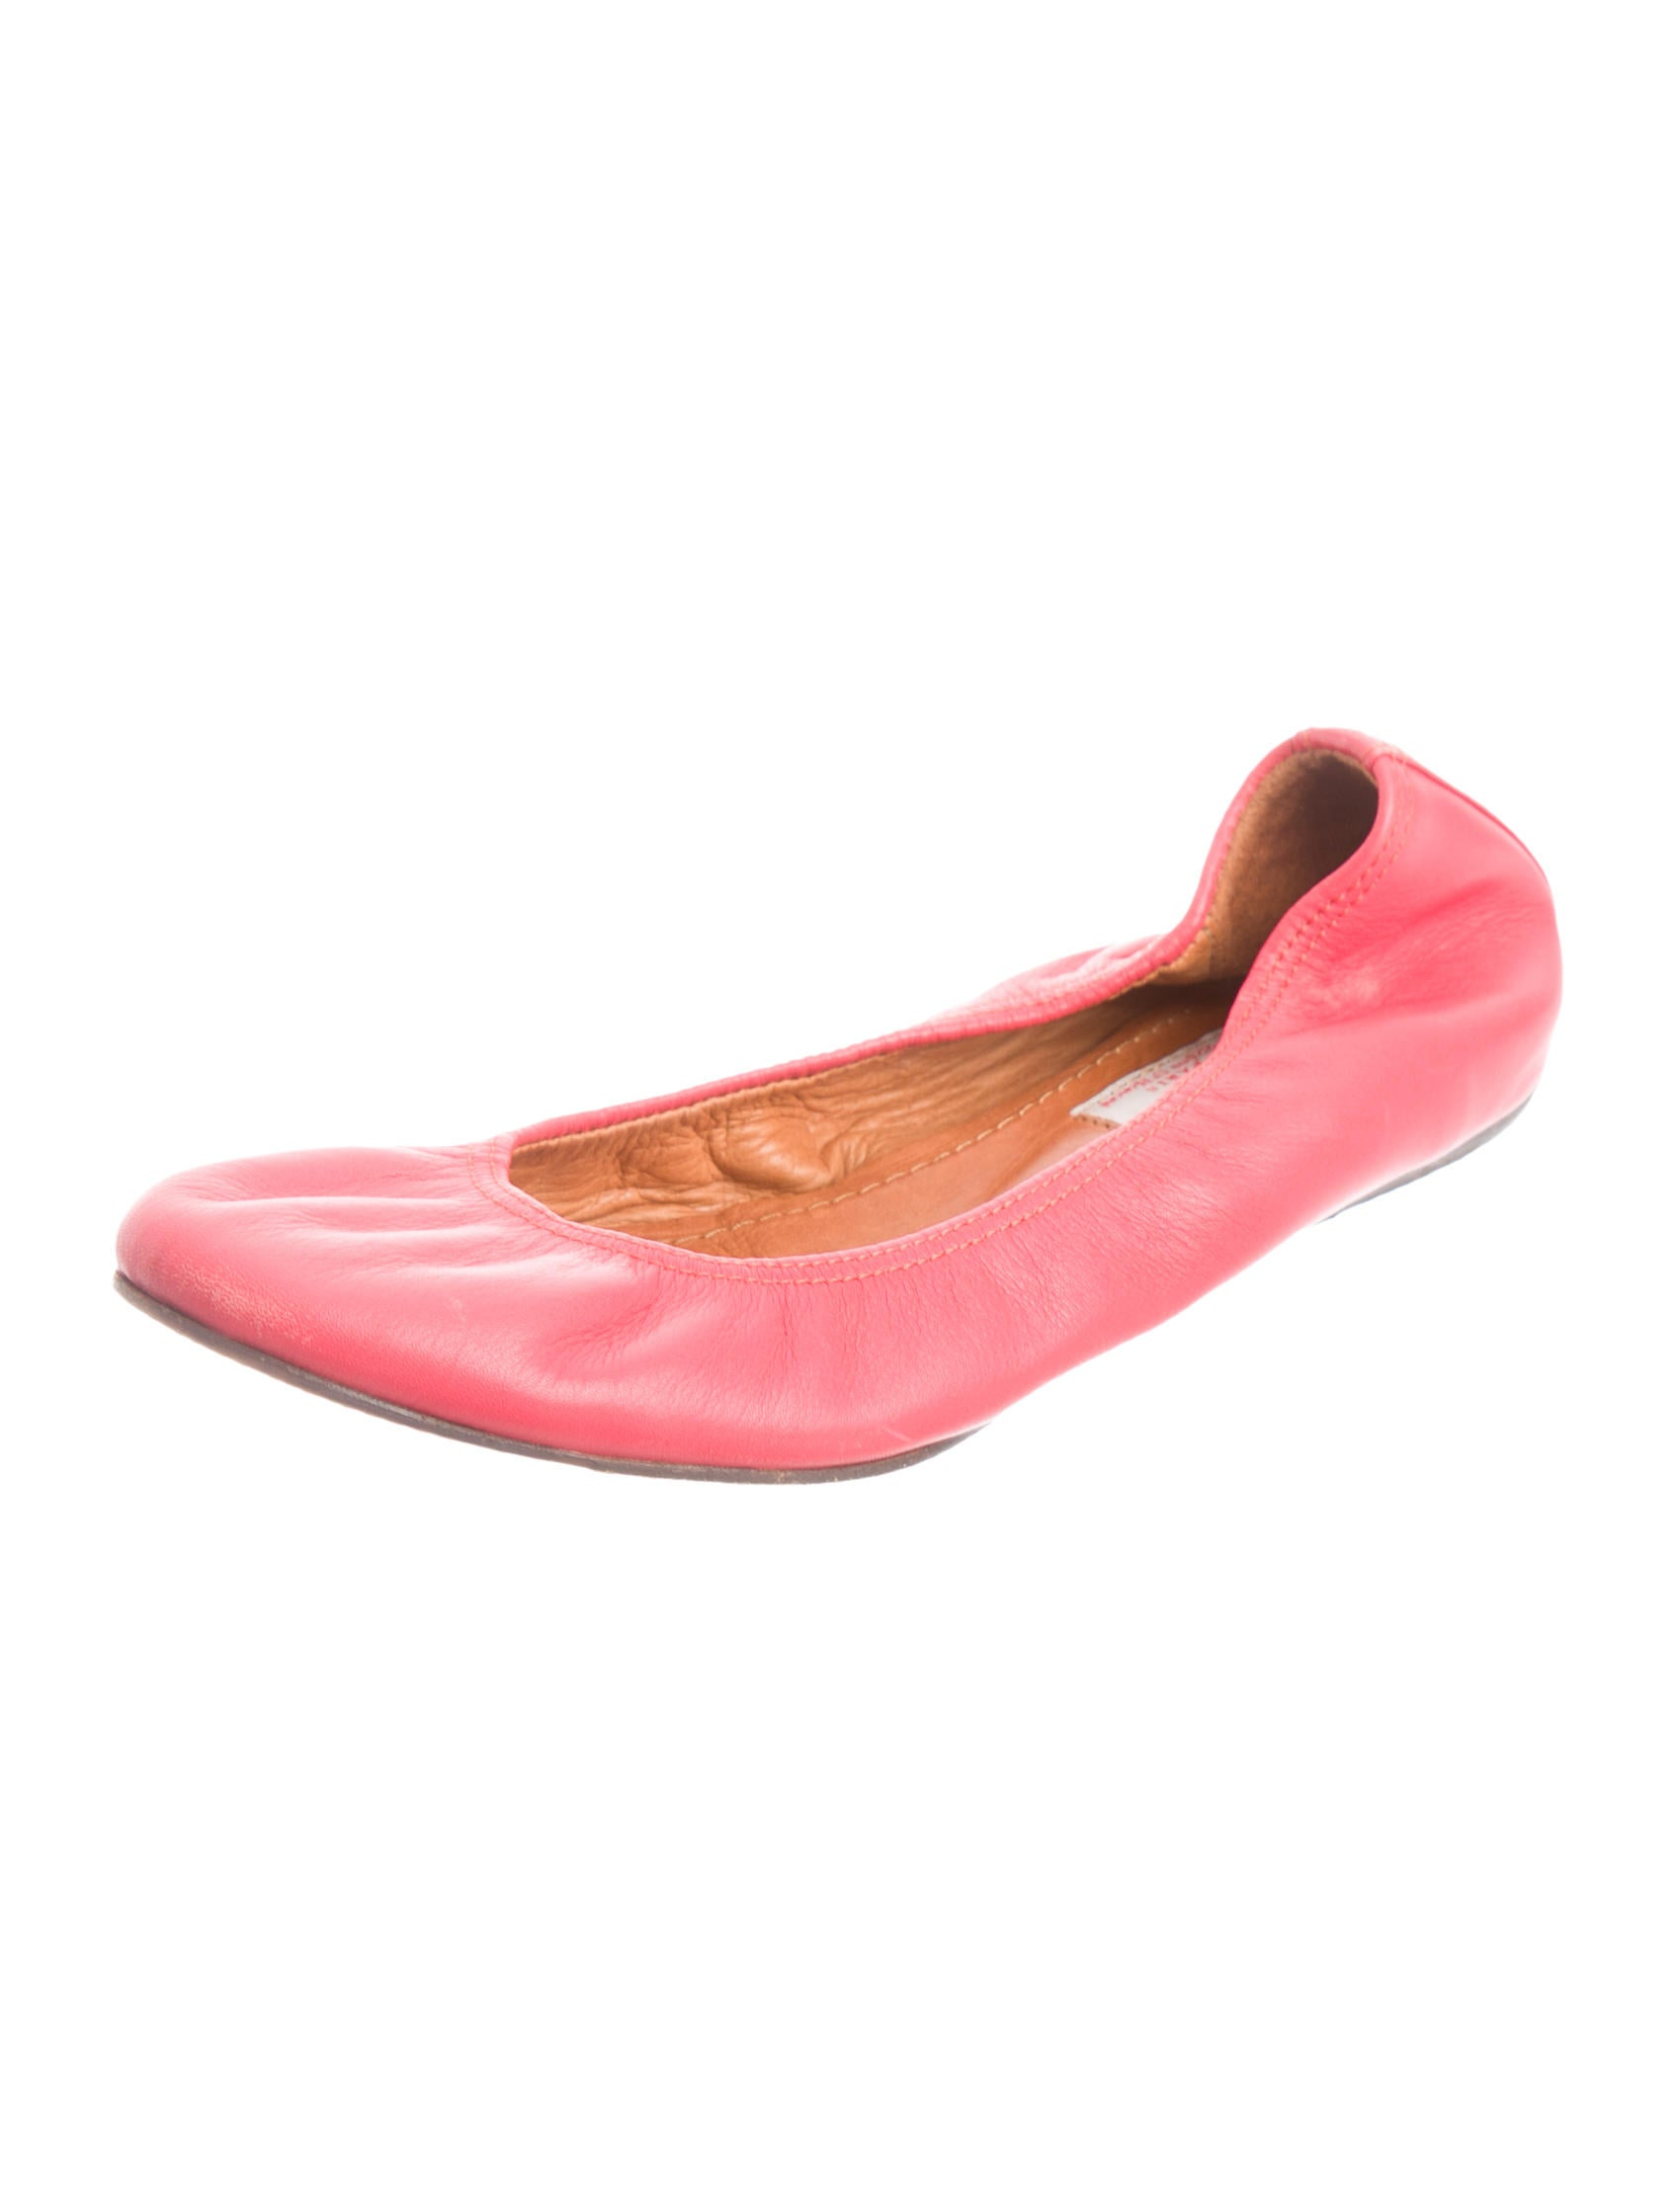 lanvin leather ballerina flats shoes lan51570 the